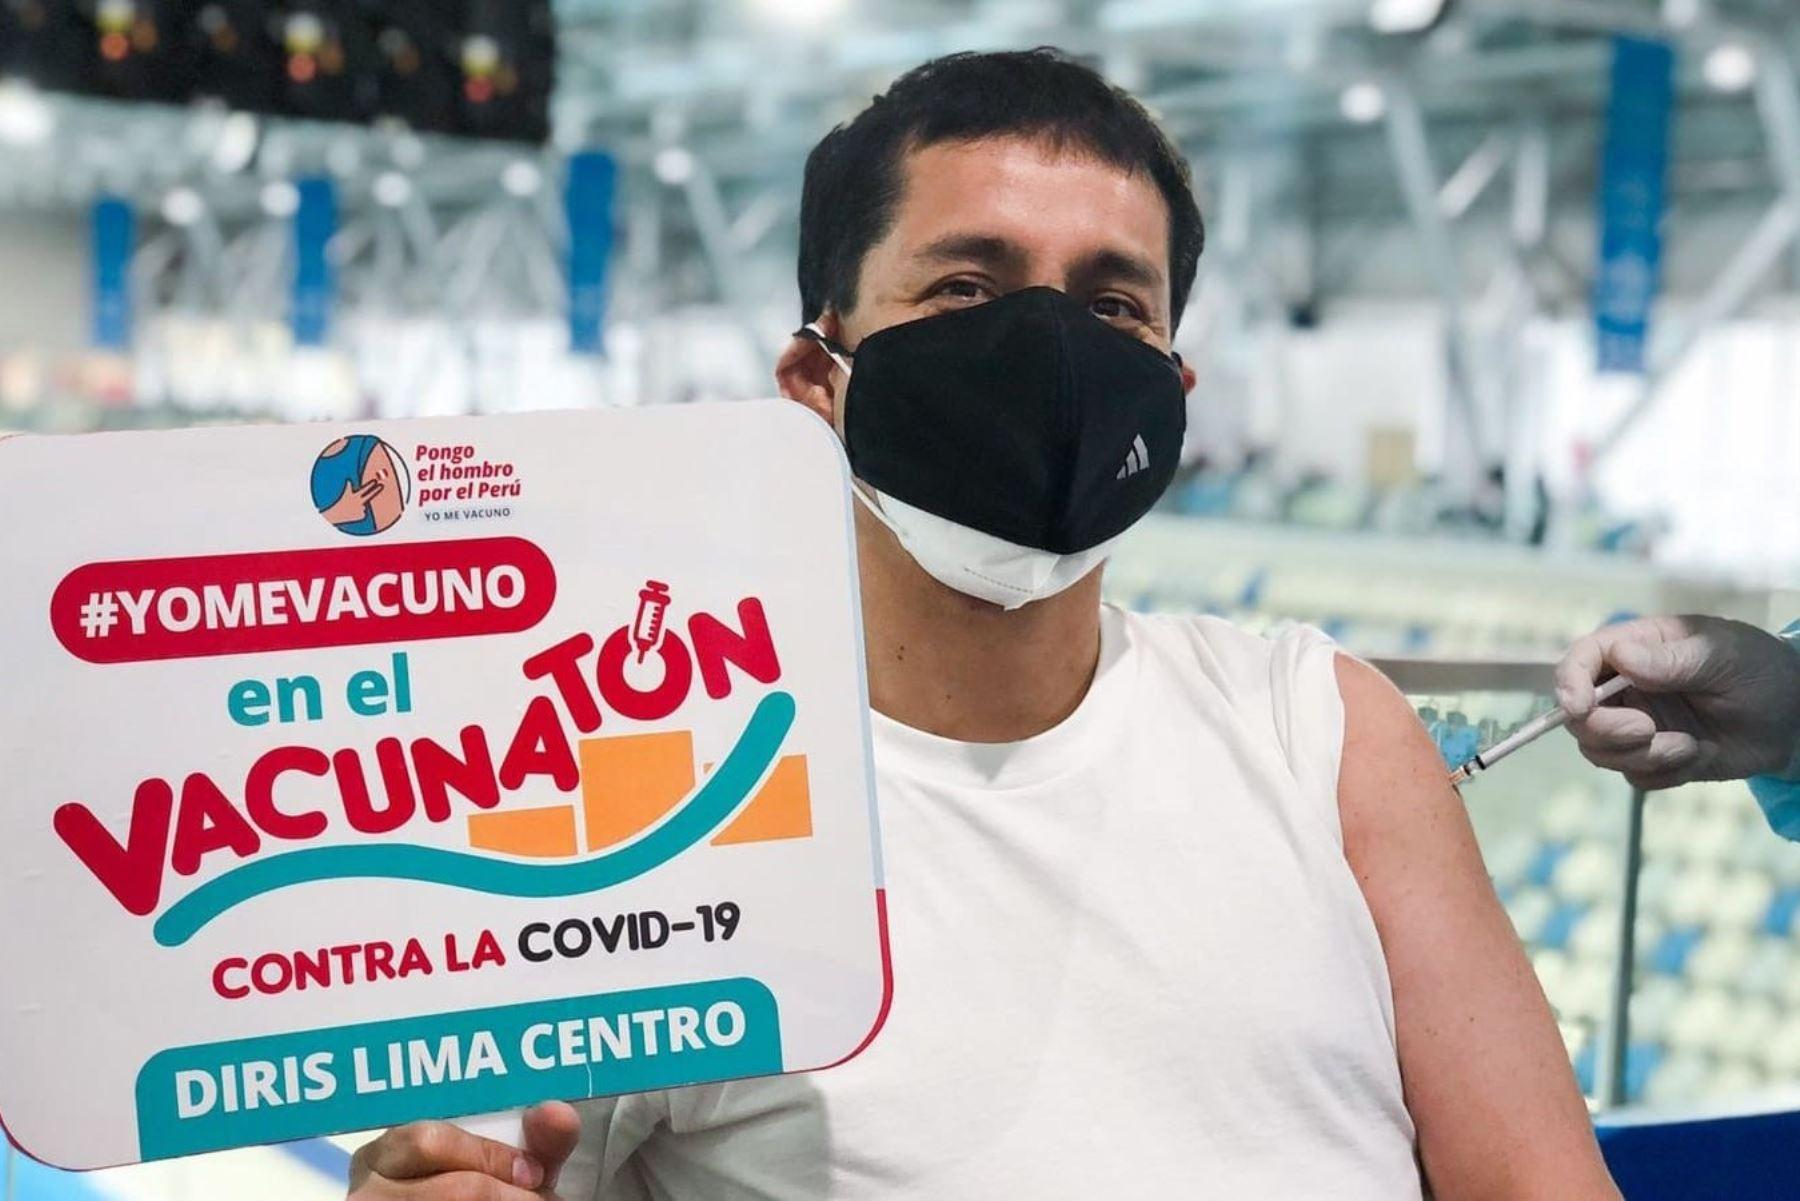 Covid-19: más de 69,000 dosis se aplicaron en distritos de Lima Centro en primer Vacunatón